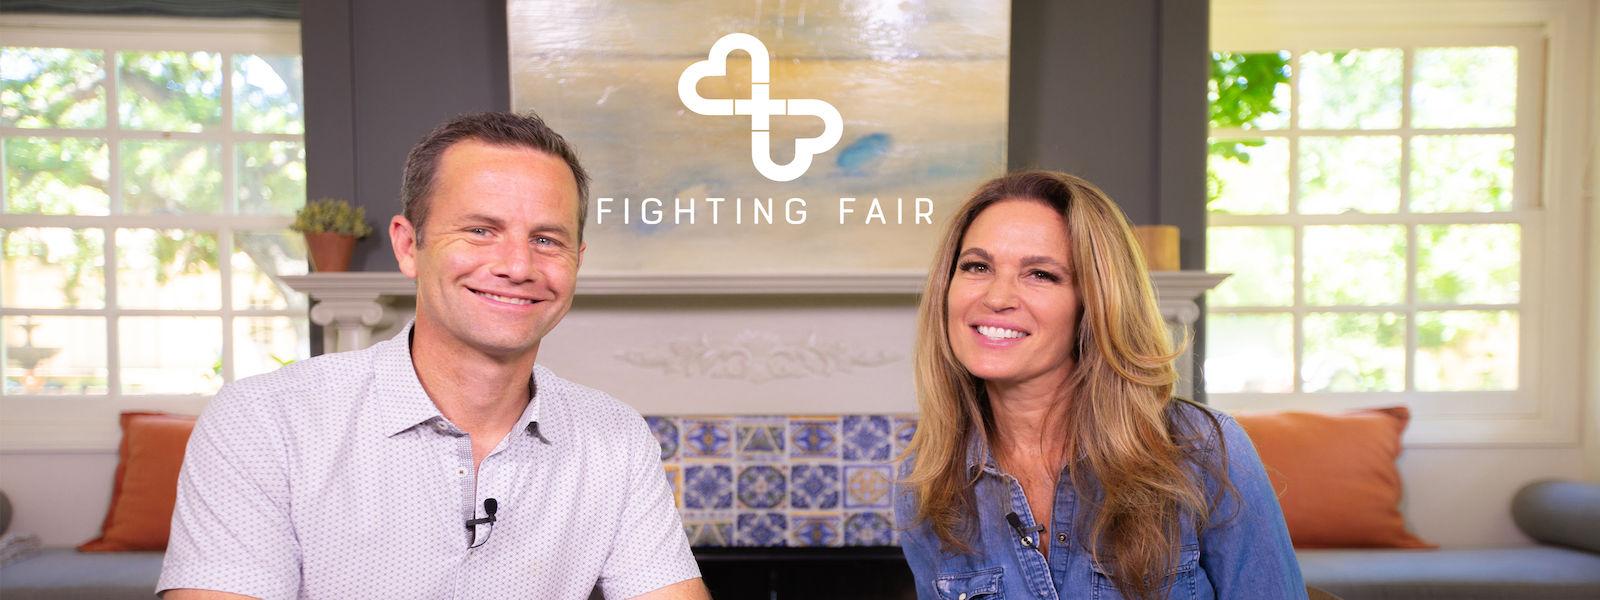 Fighting Fair